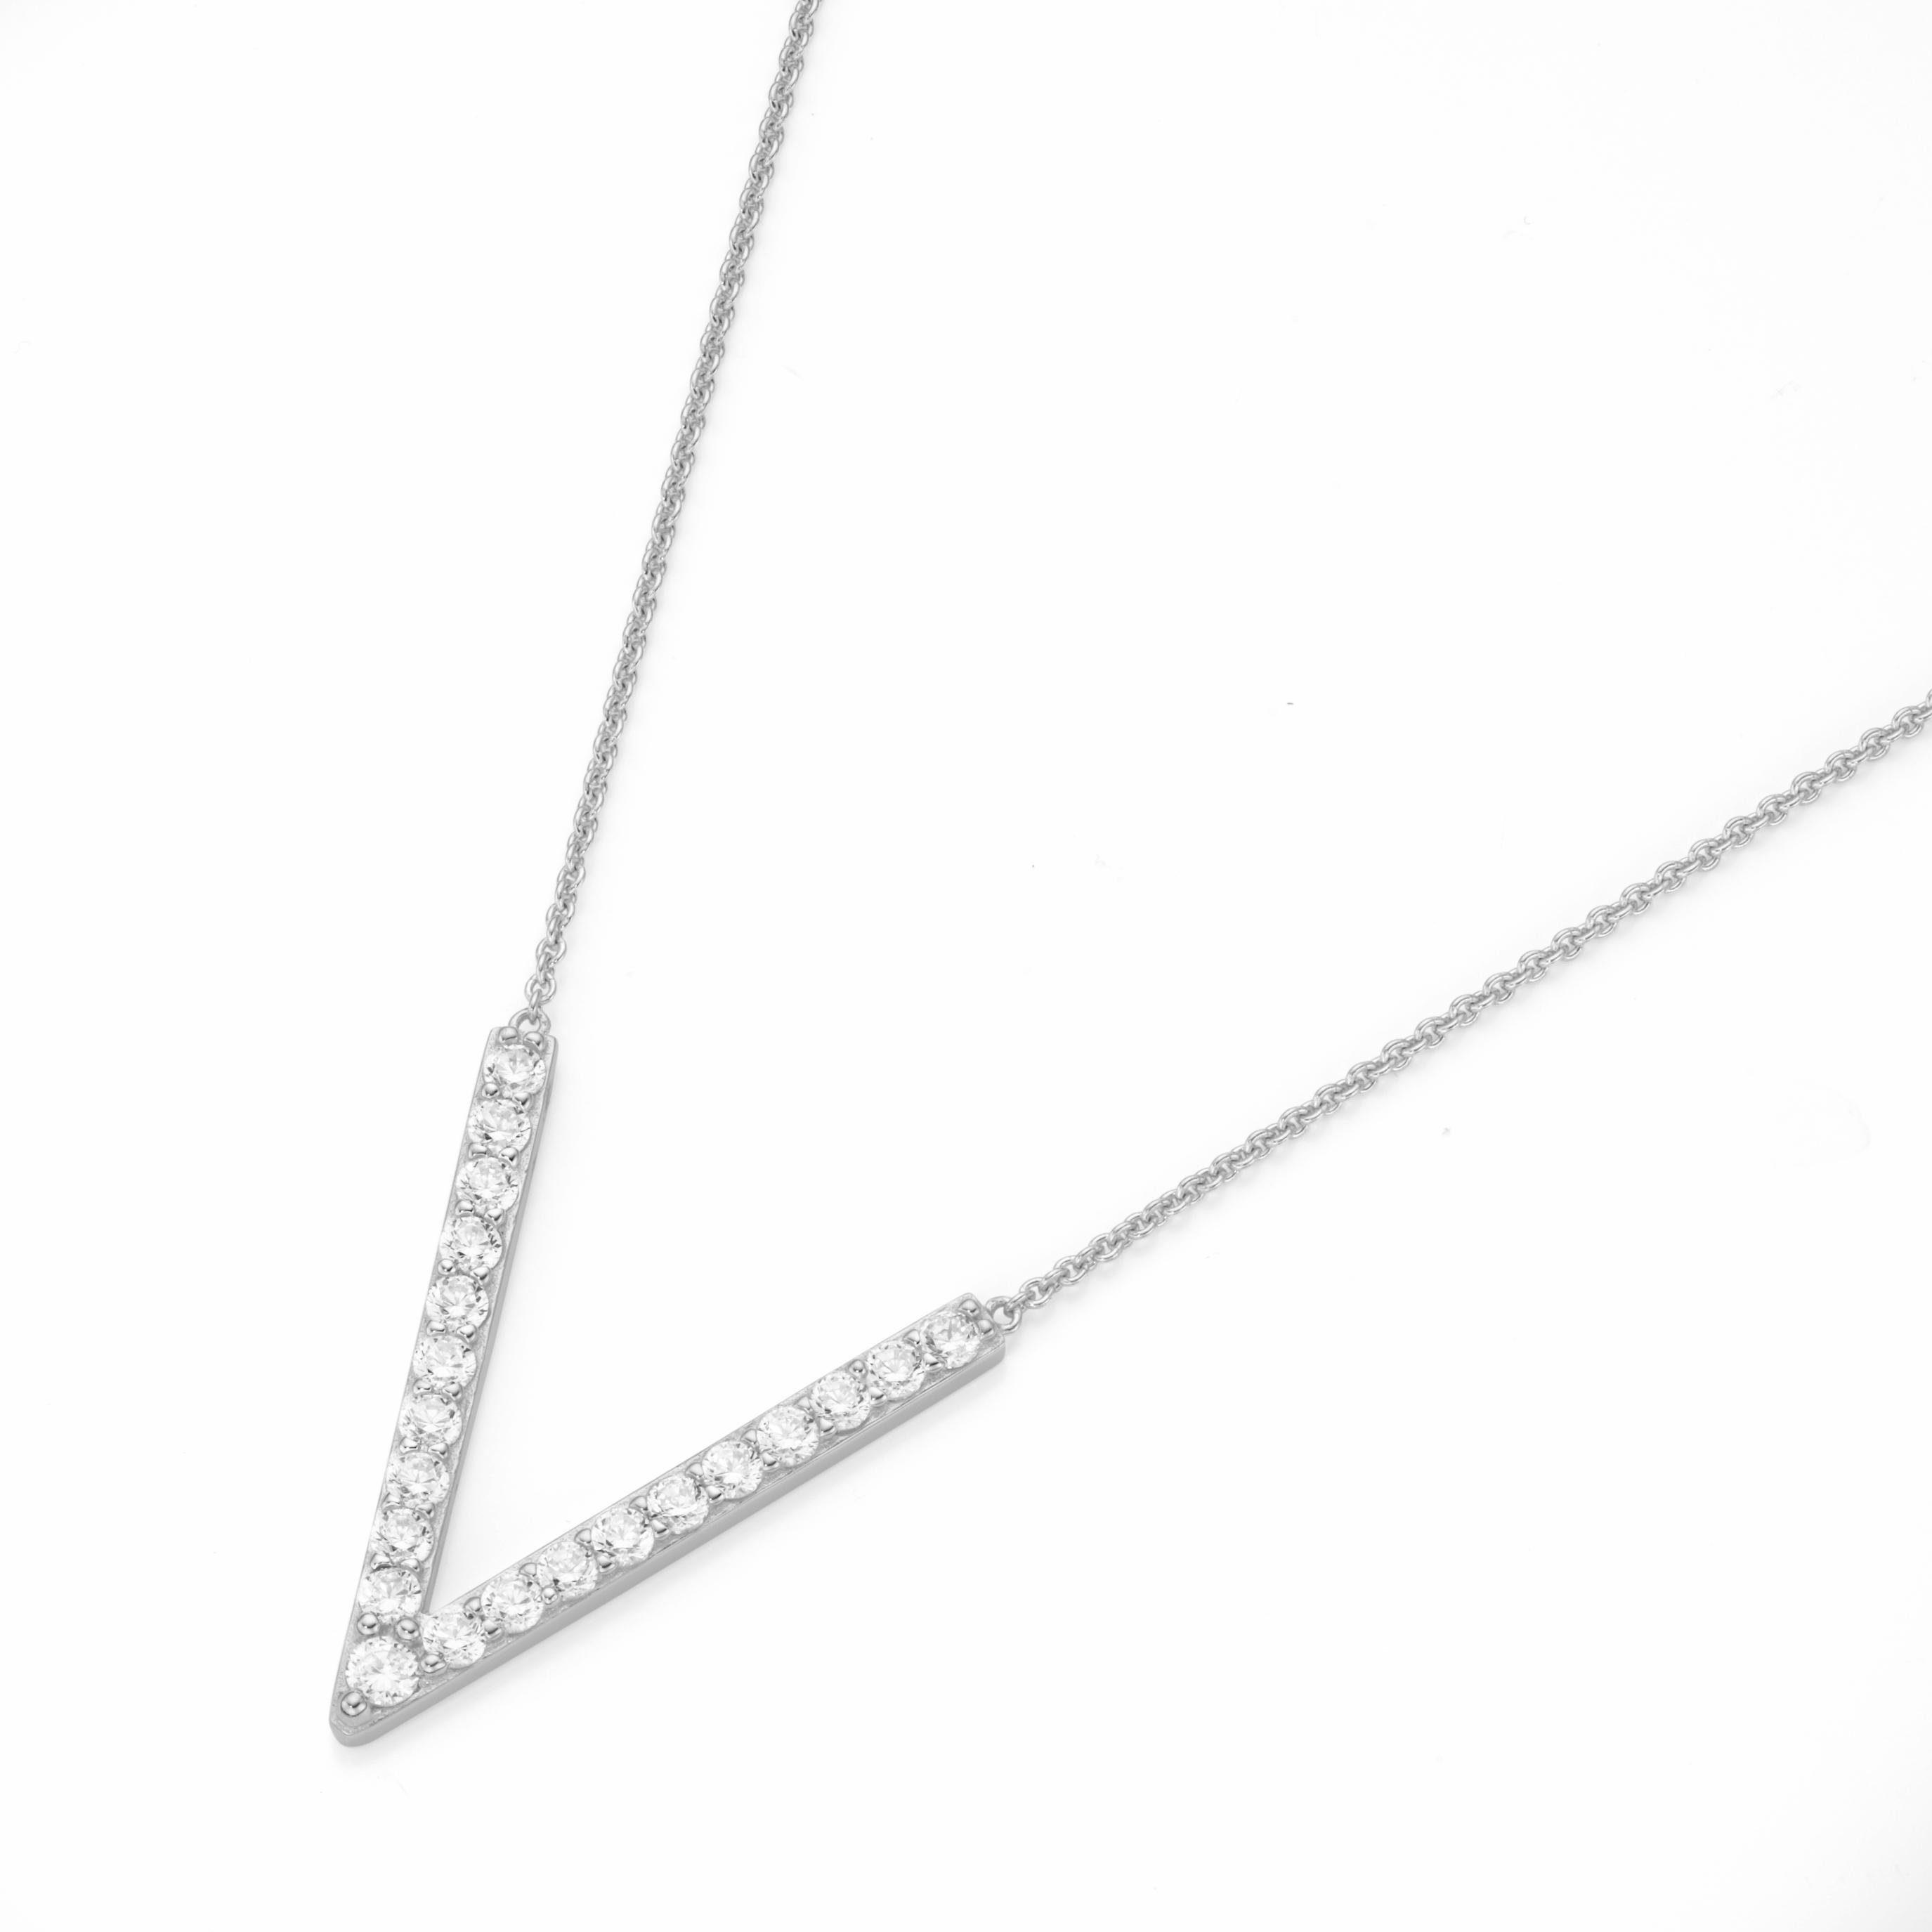 GIORGIO MARTELLO MILANO Silberkette »195138693450« mit Zirkonia